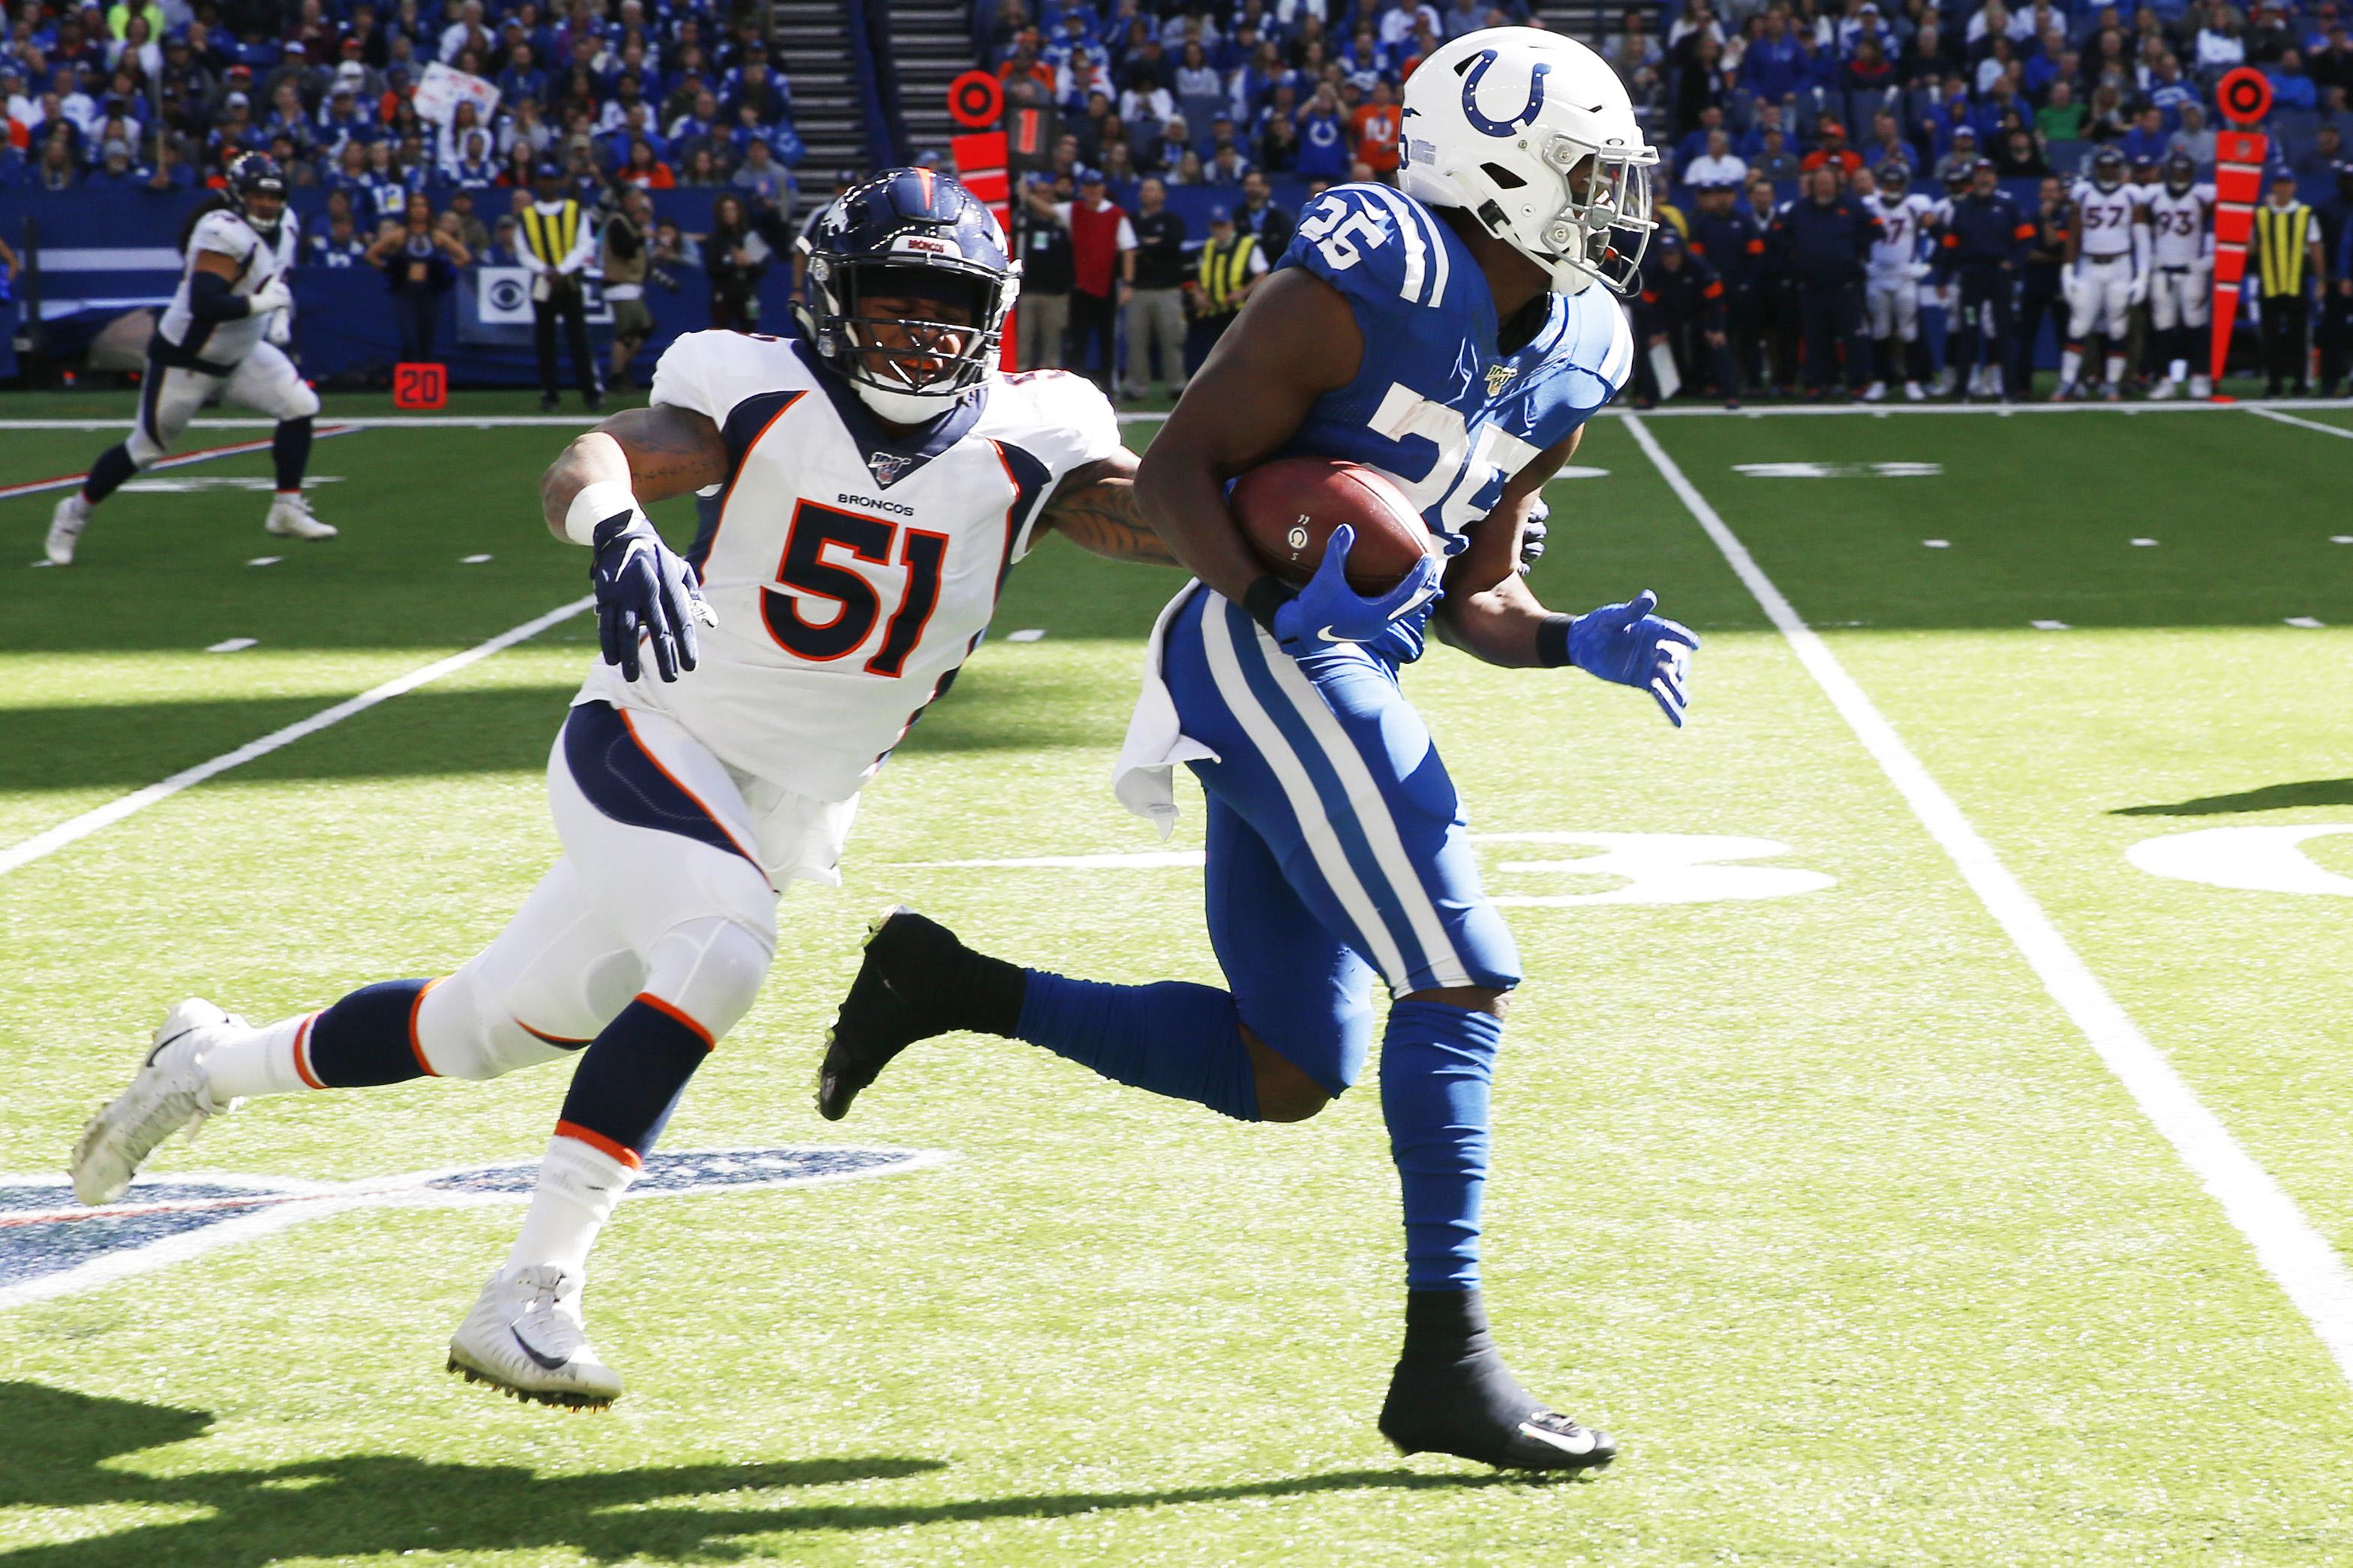 Indianapolis Colts running back Marlon Mack (25) runs away from Denver Broncos linebacker Todd Davis (51) during the first quarter at Lucas Oil Stadium.